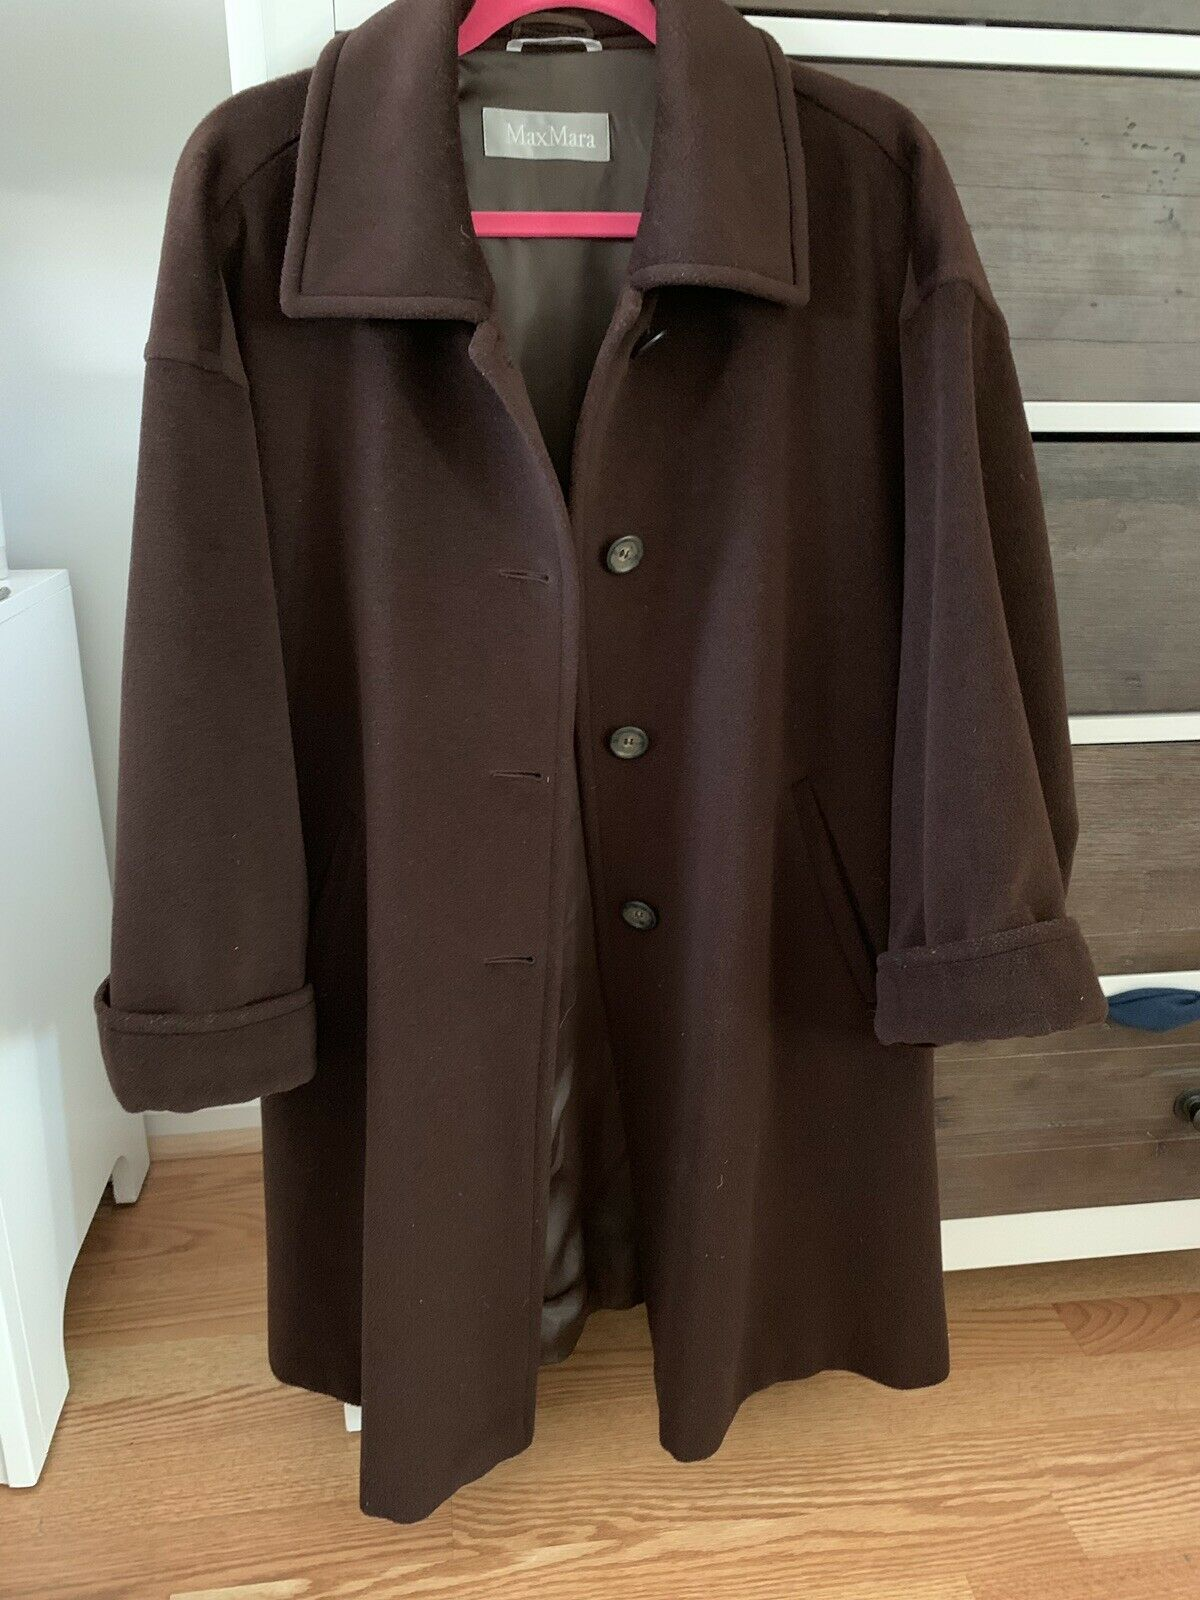 100% Authentic Max Mara Chocolate Brown Wool Coat Women's Size 6 in EC Swing